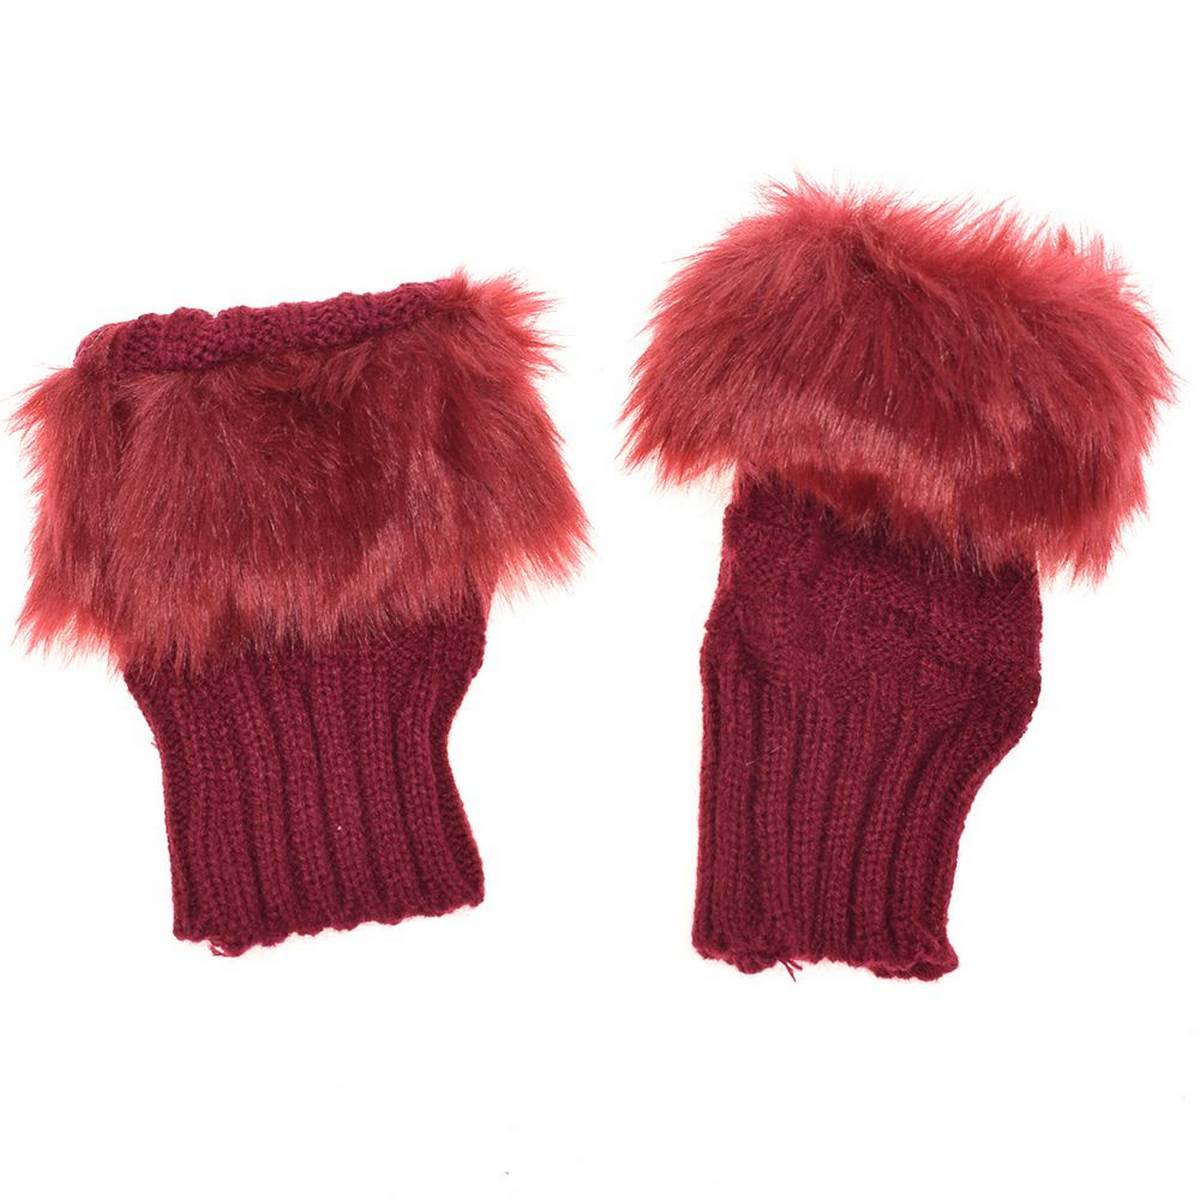 Fancy Winter Women Gloves  Knitting Wool Keep Warm Short Mitten Fingerless Lady Girl Half Finger Glove